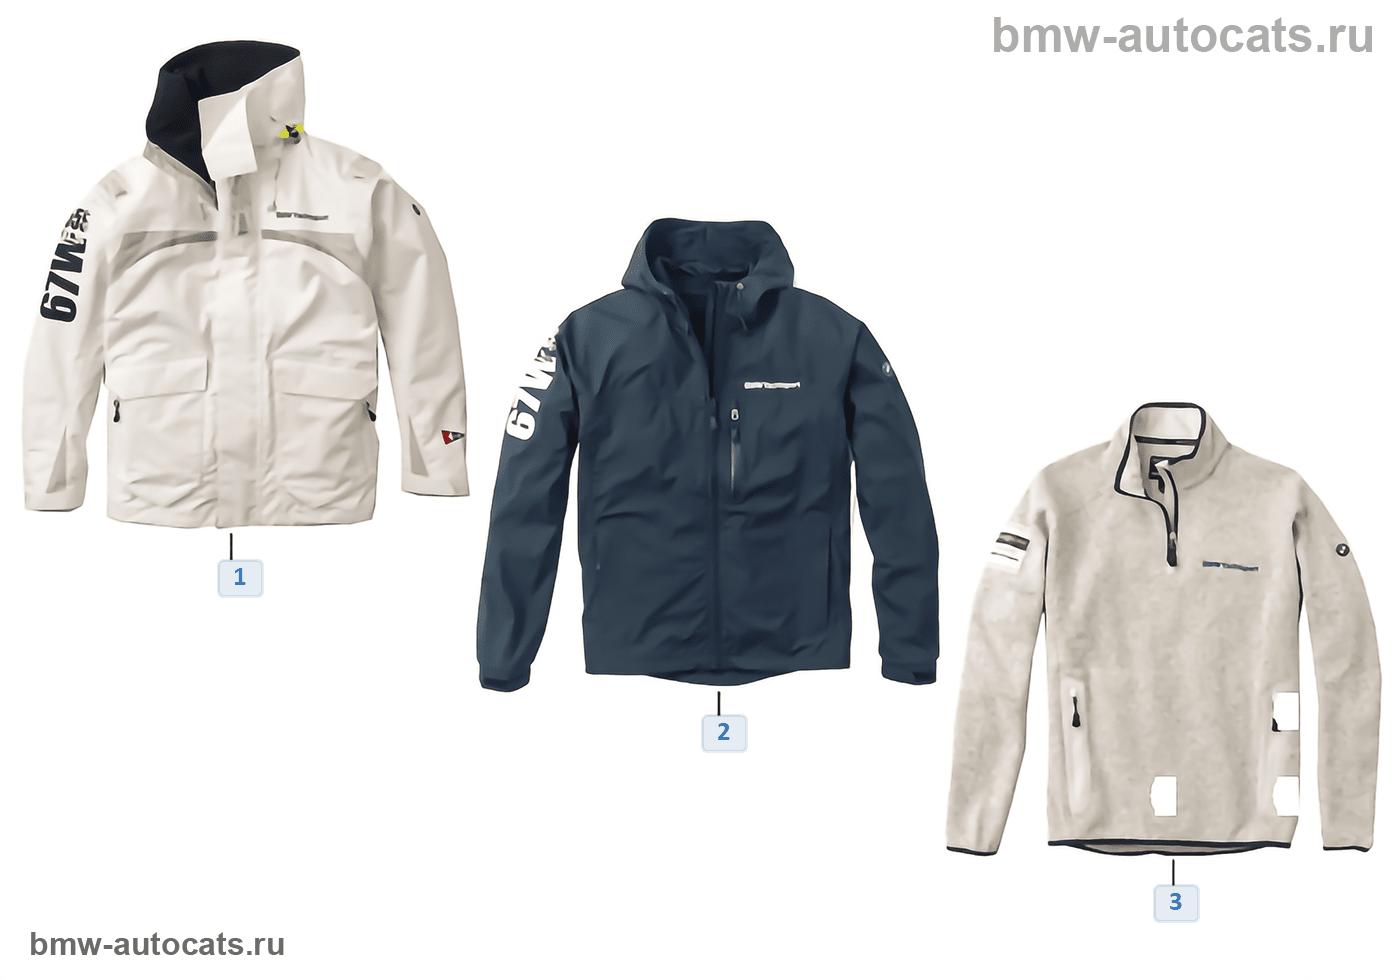 Yachtsport-Мужск.куртки/пуловеры 2013/14